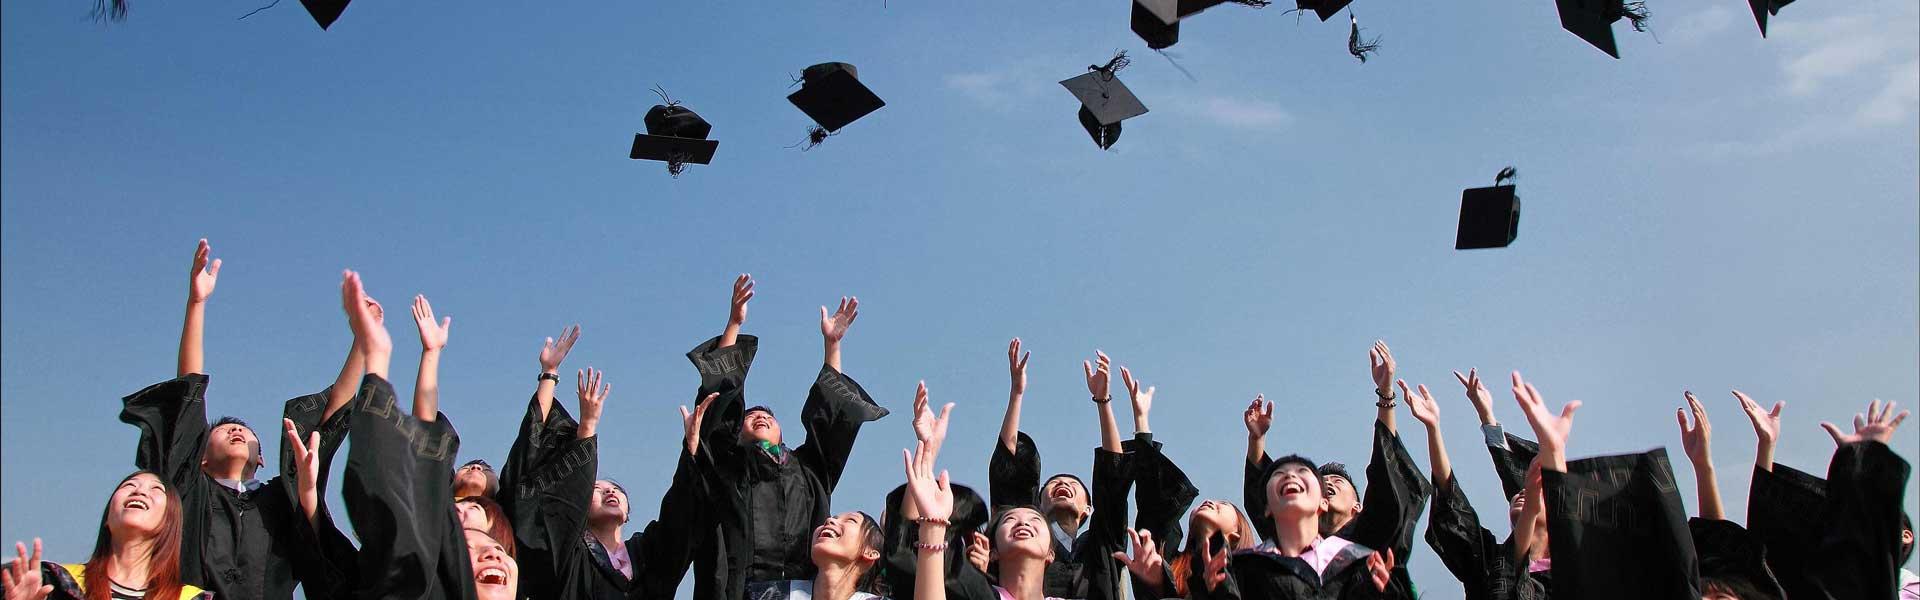 Graduates throwing hats